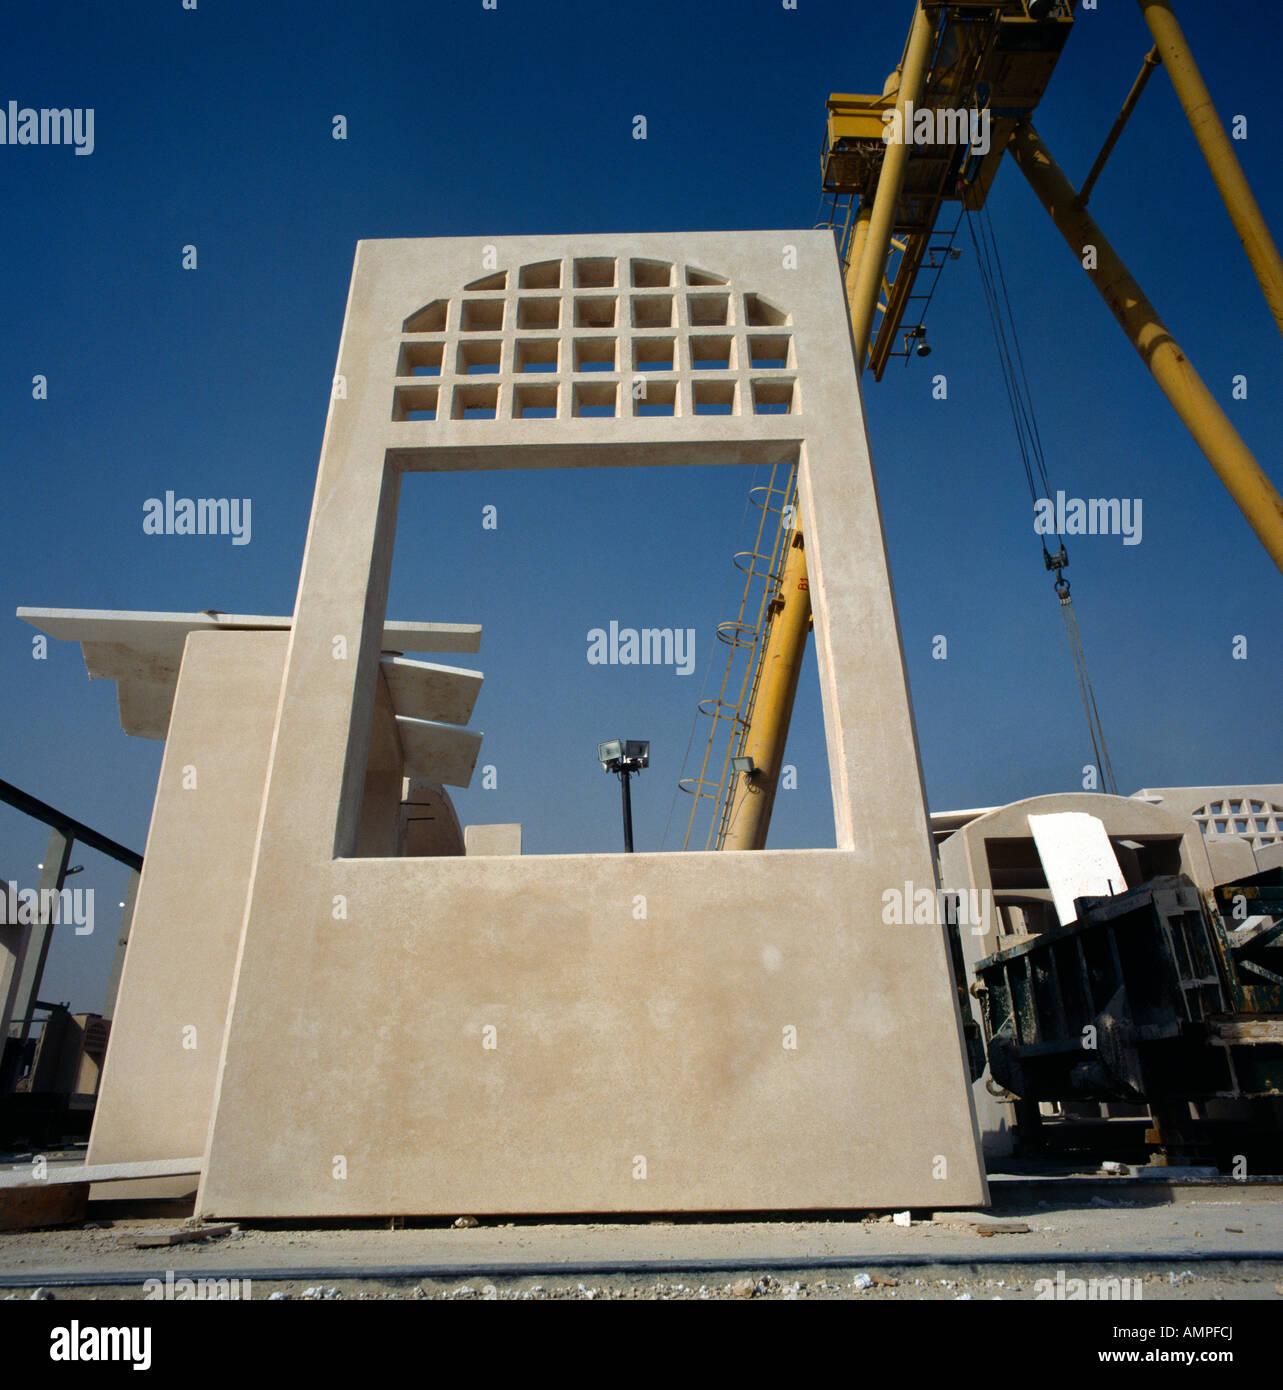 Prefabricated Panels Construction Stock Photos